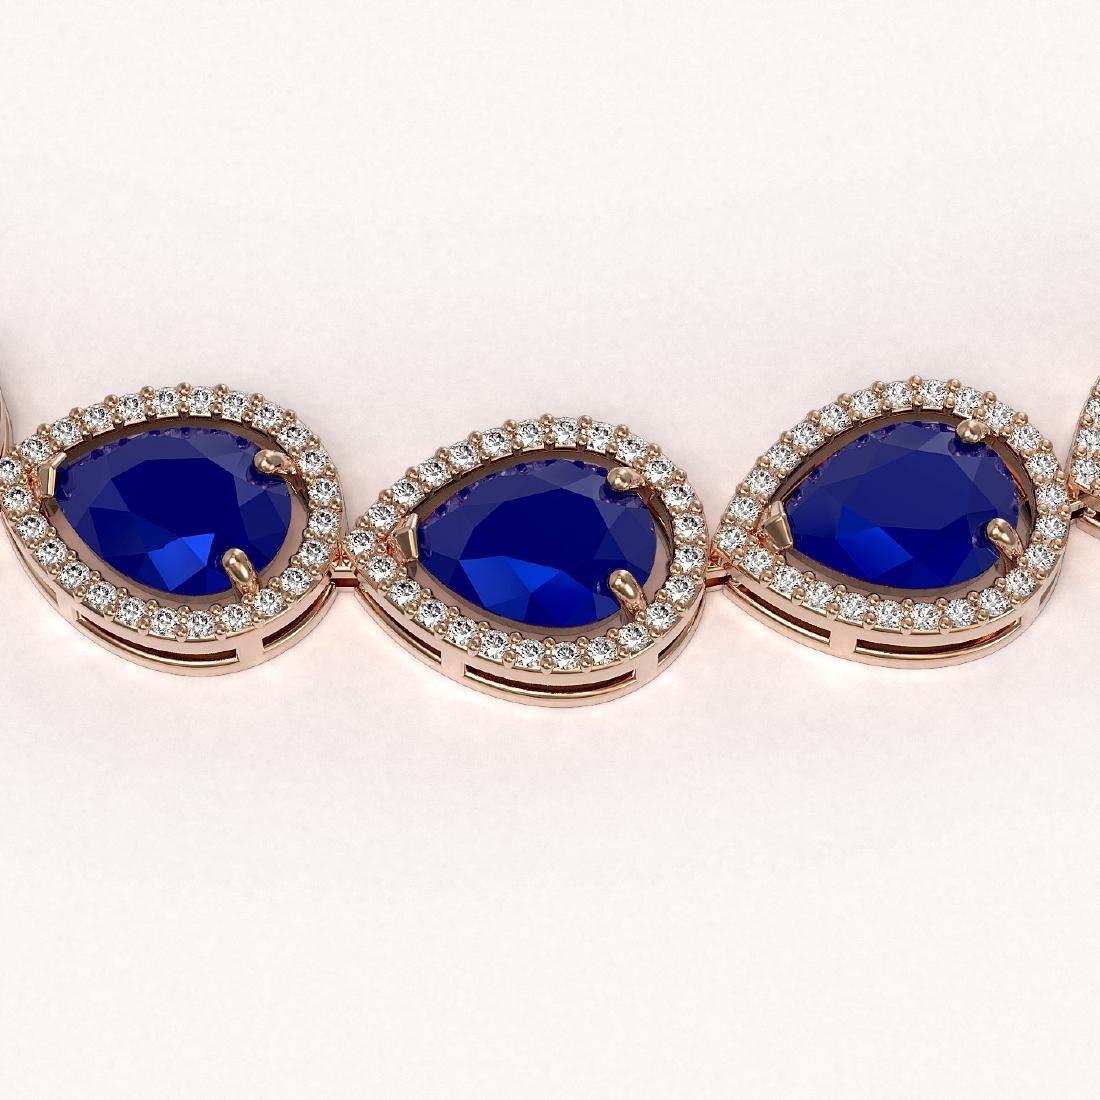 64.01 CTW Sapphire & Diamond Halo Necklace 10K Rose - 3